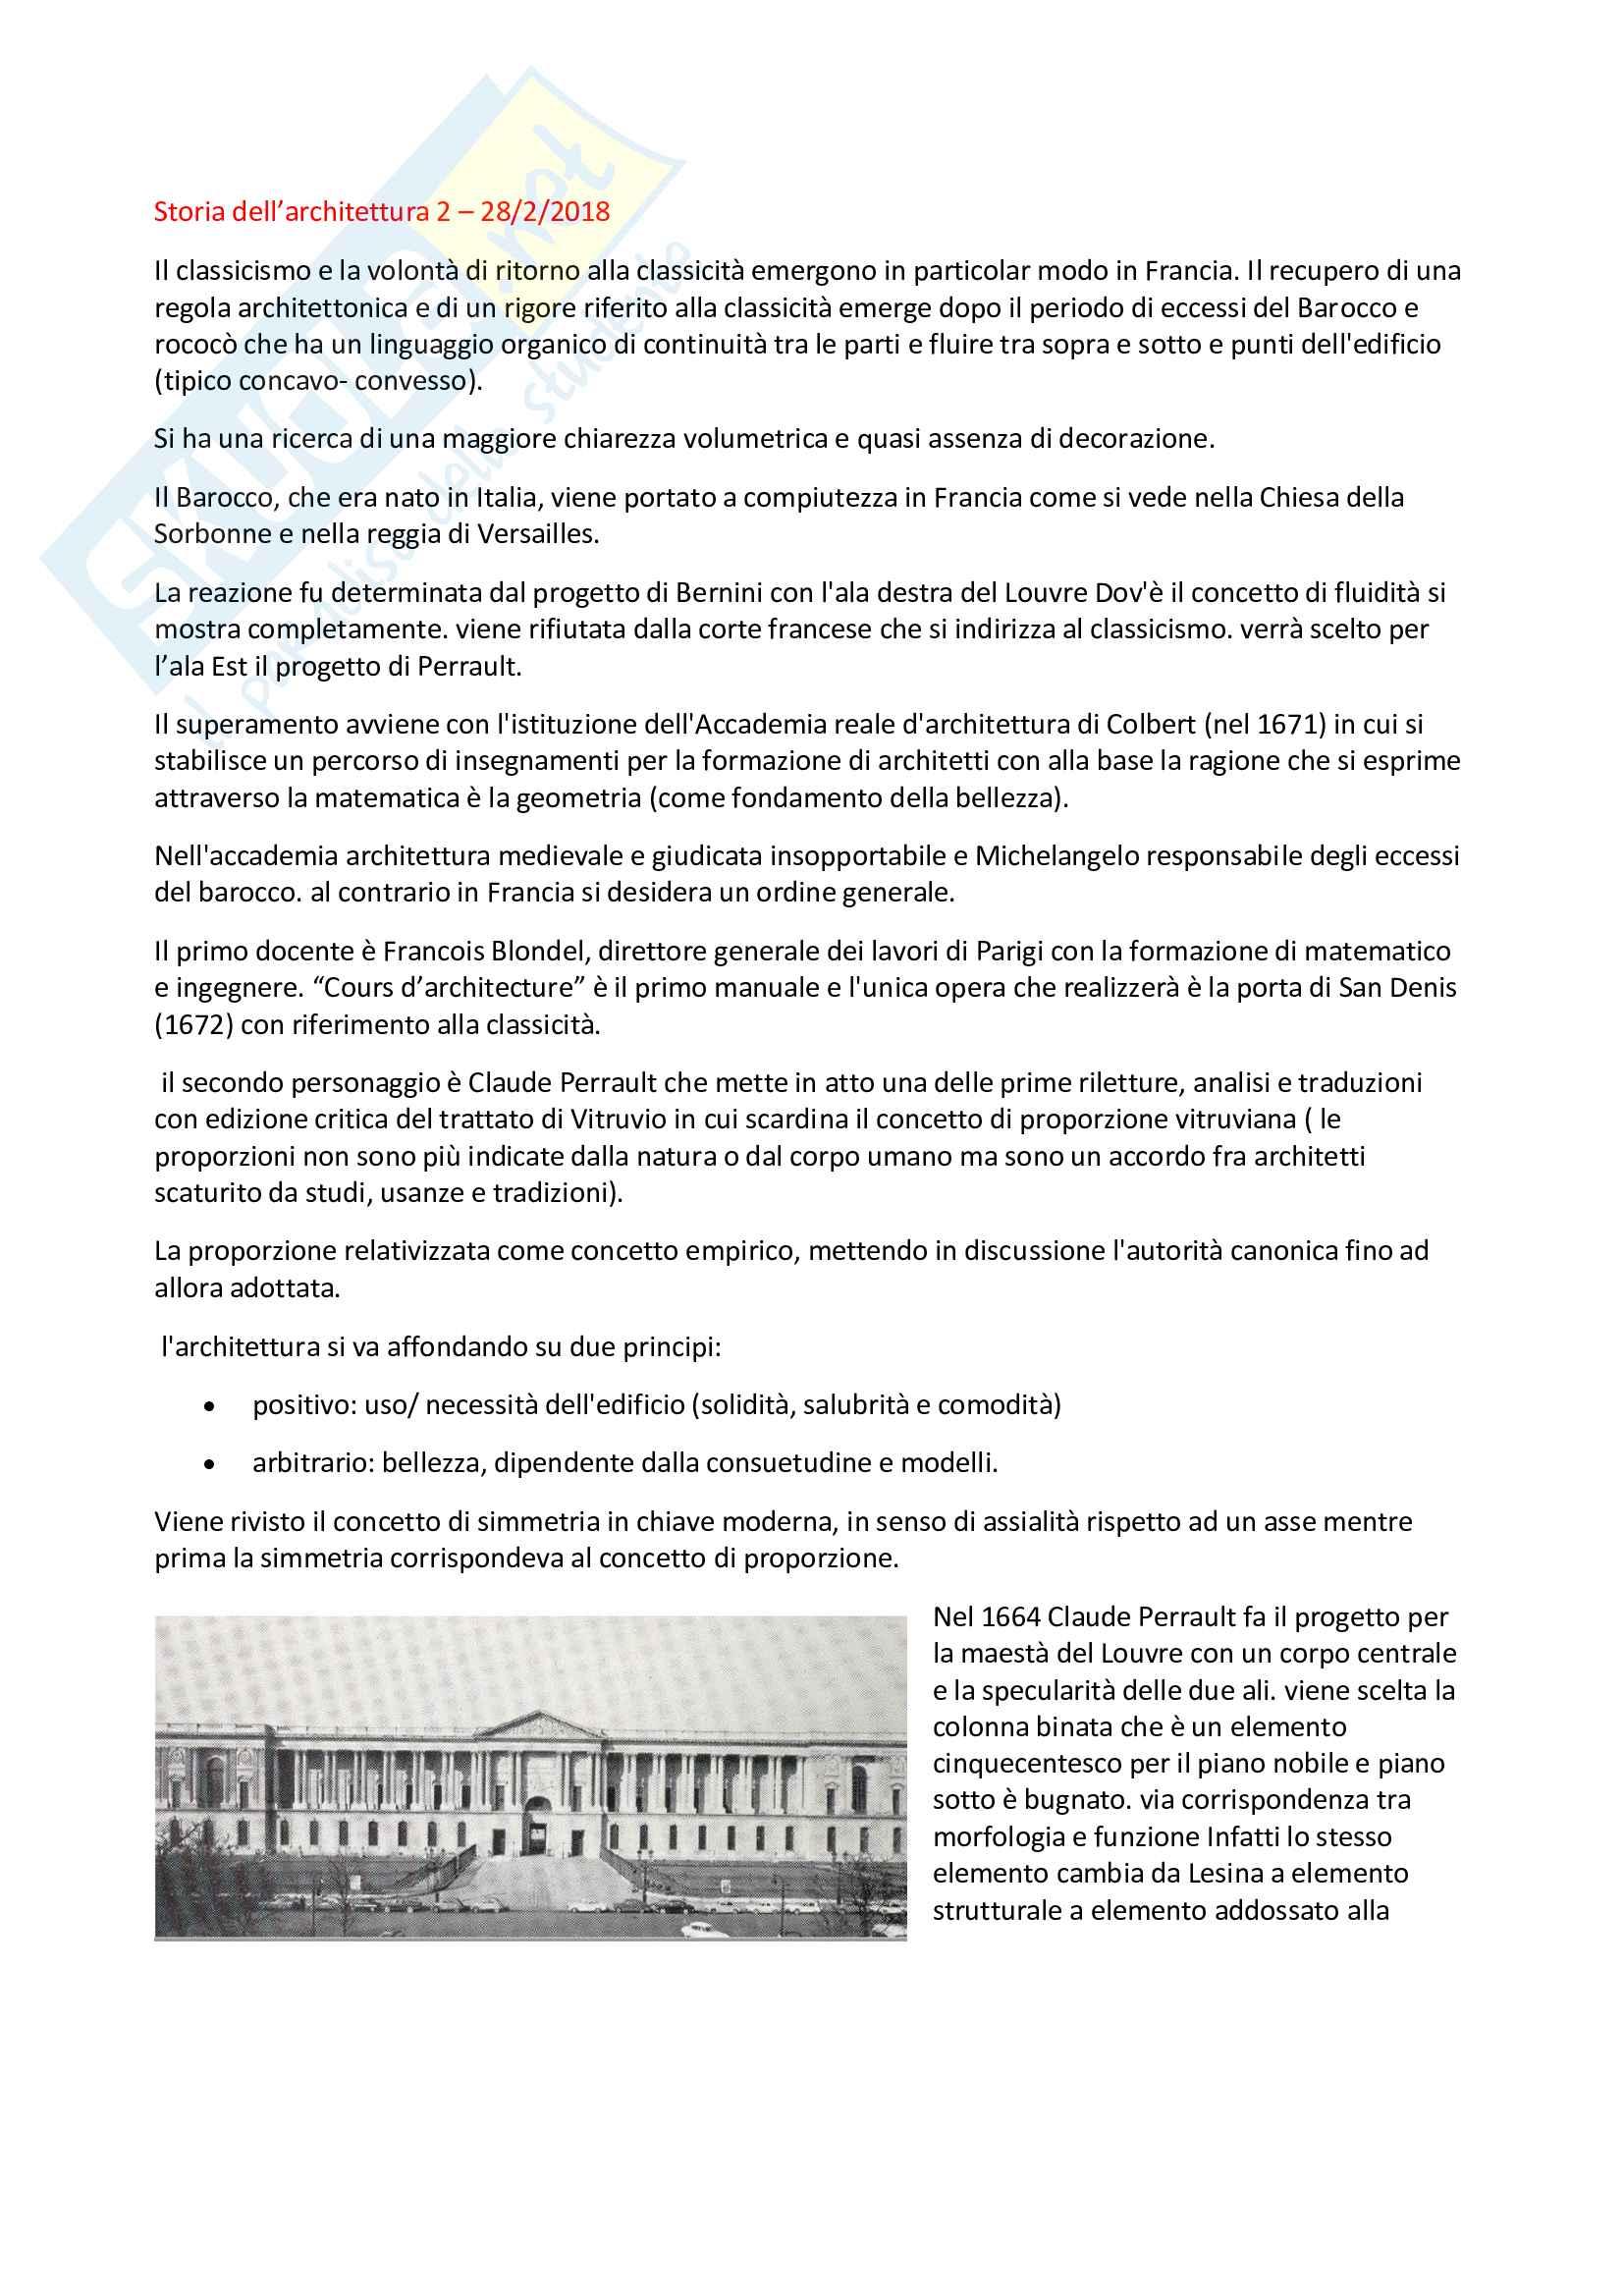 Storia dell'architettura 2, Iacobone, Lezioni